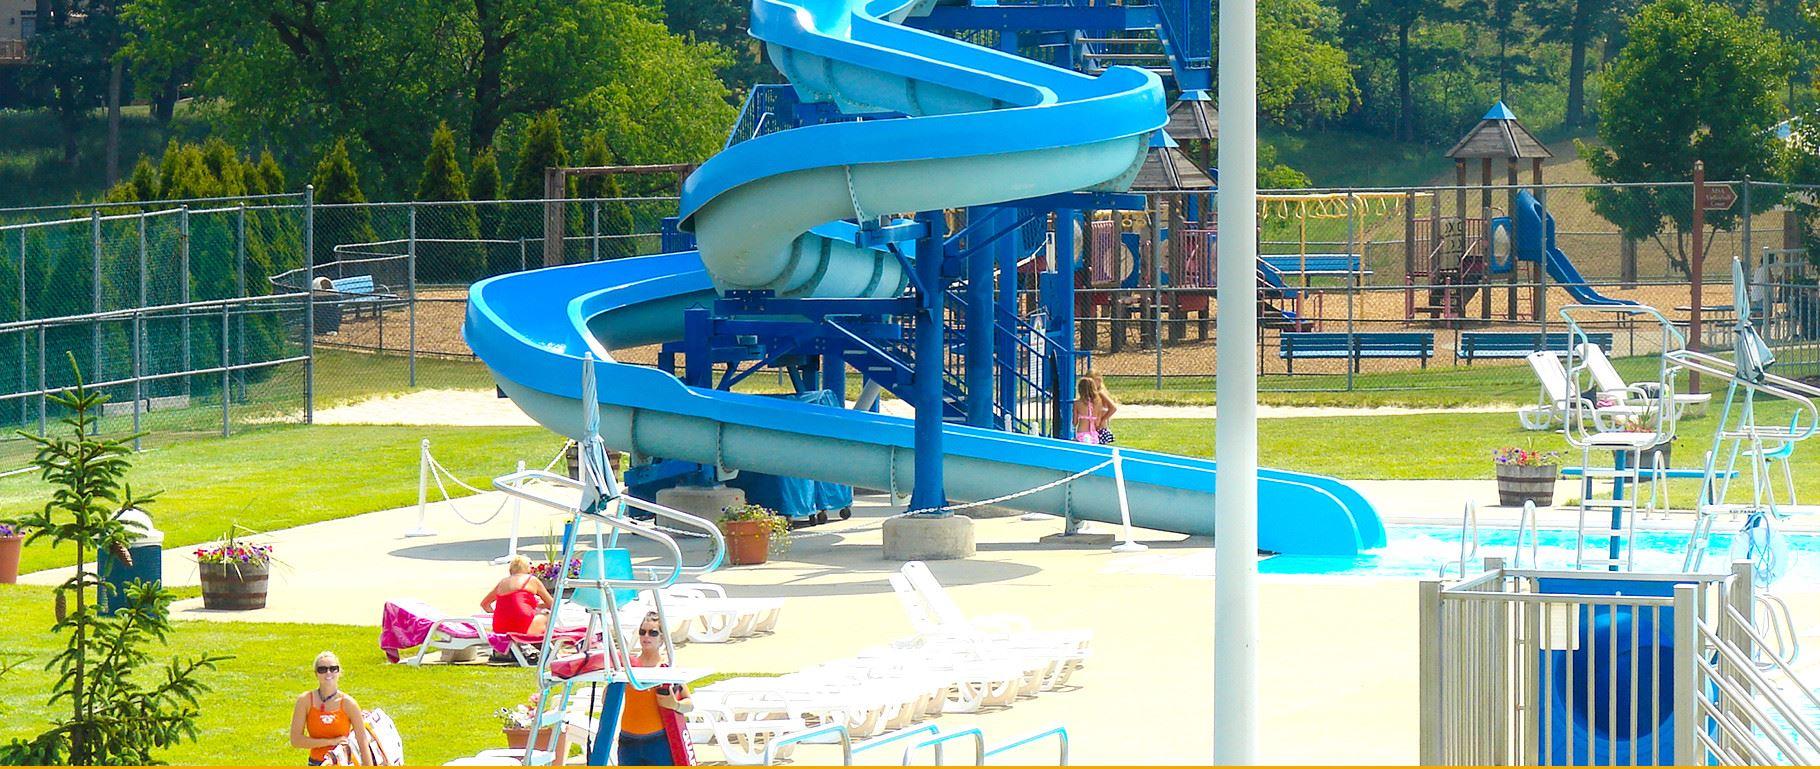 Parks & Recreation | Cranberry Township - Official Website